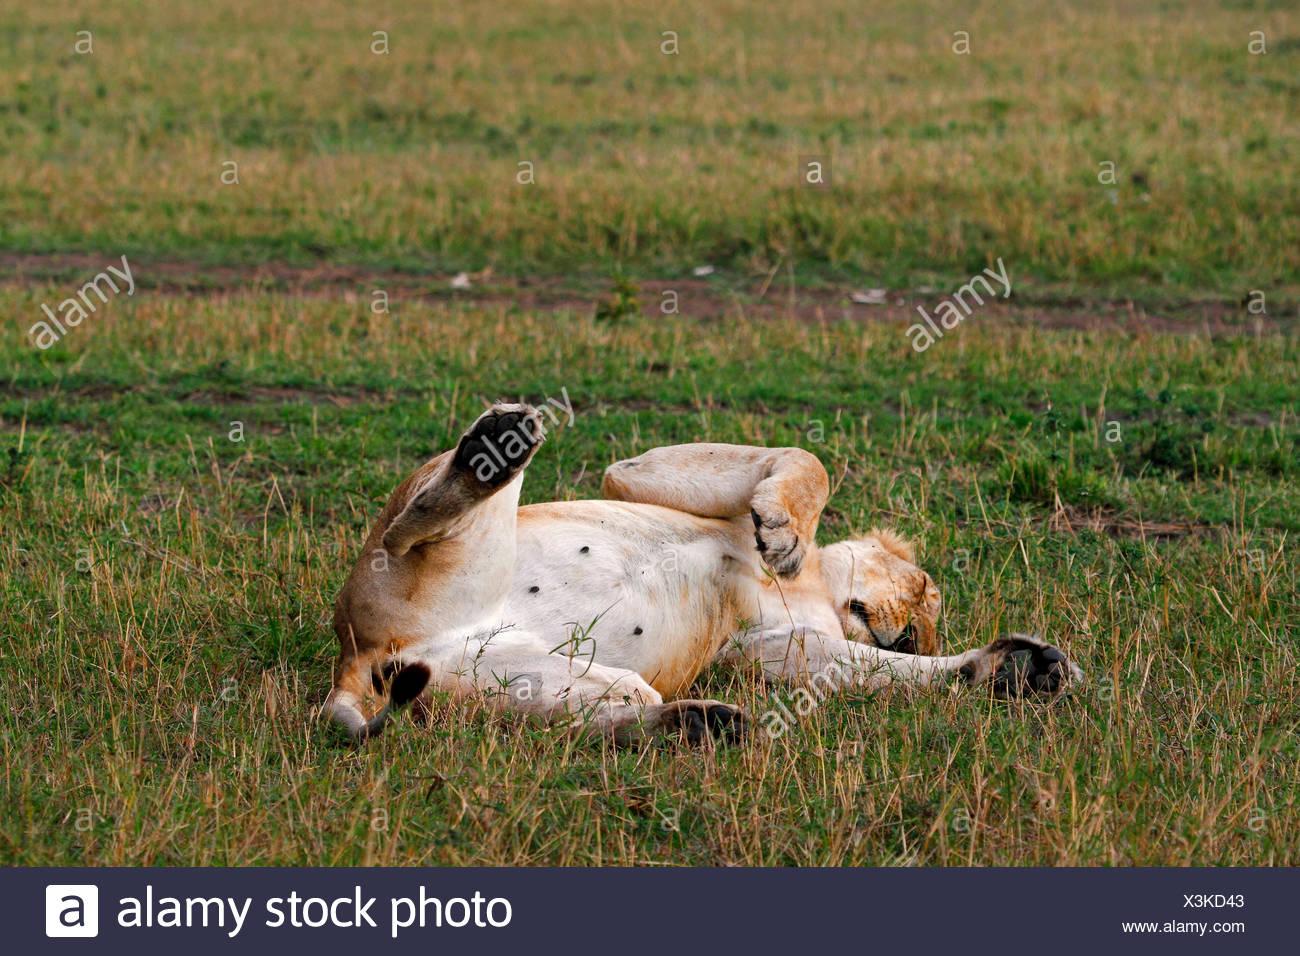 lion (Panthera leo), lys in supine position sleeping, Kenya, Masai Mara National Park - Stock Image